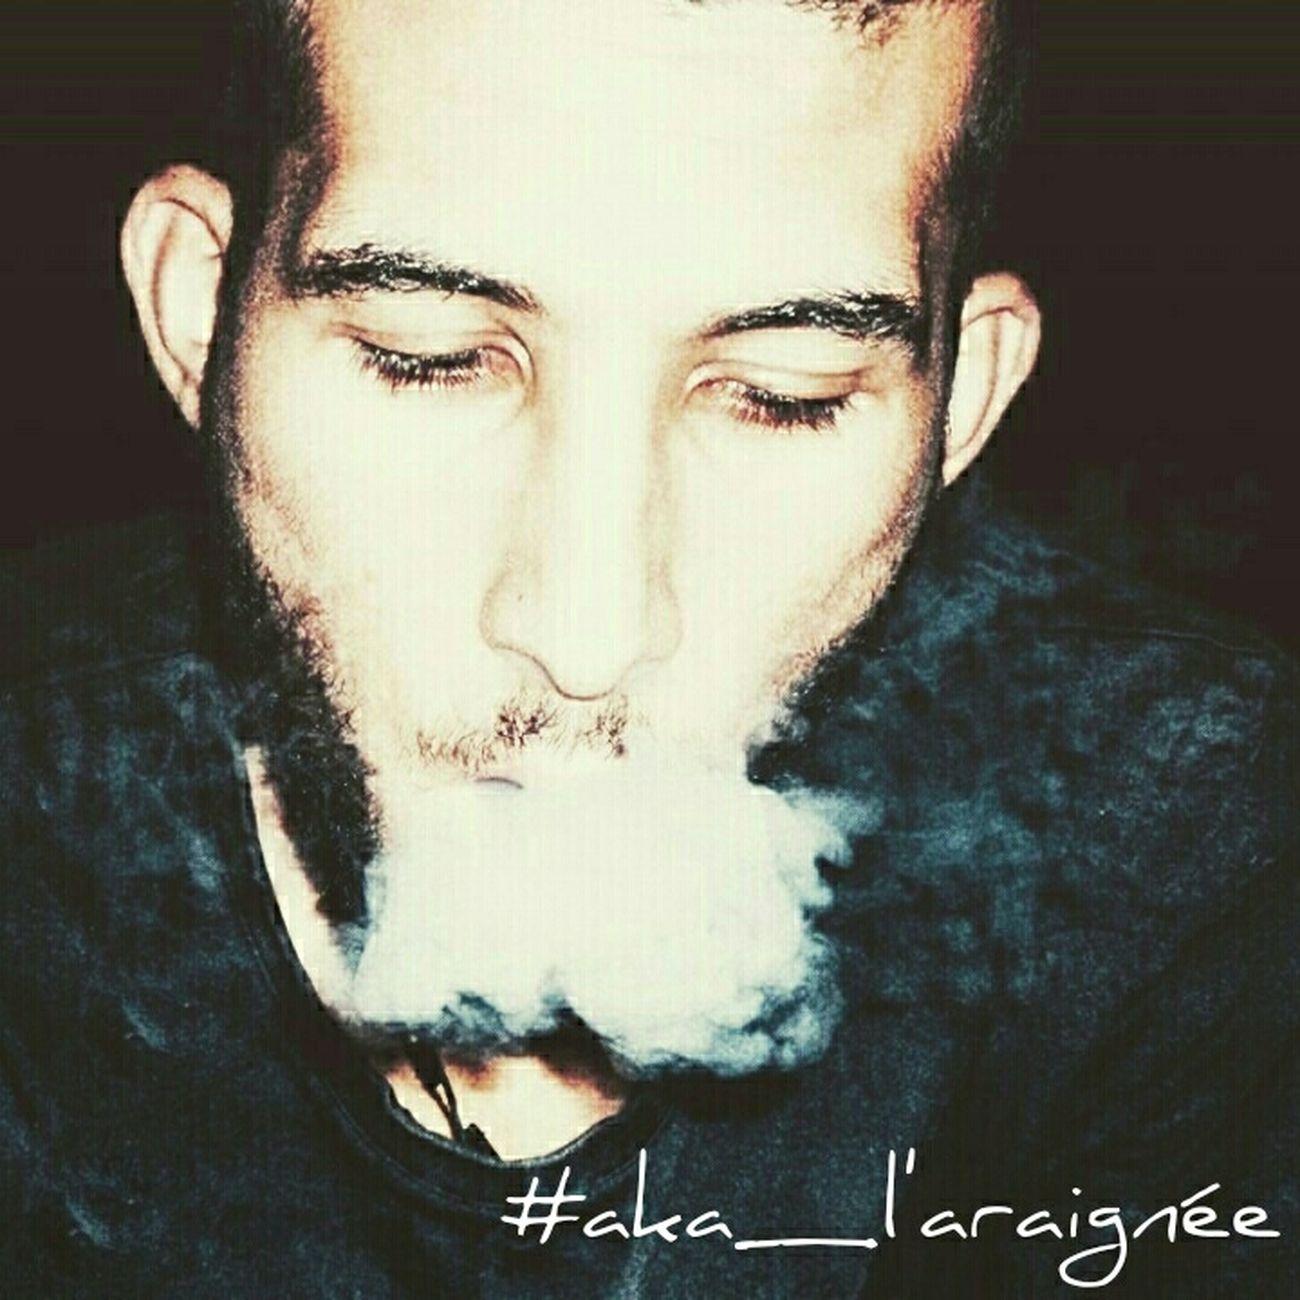 Smoking Chicha 😍 Relaxing Taking Photos Hi! Check This Out Enjoying Life Cheese! Algeria Peaceful Hello World